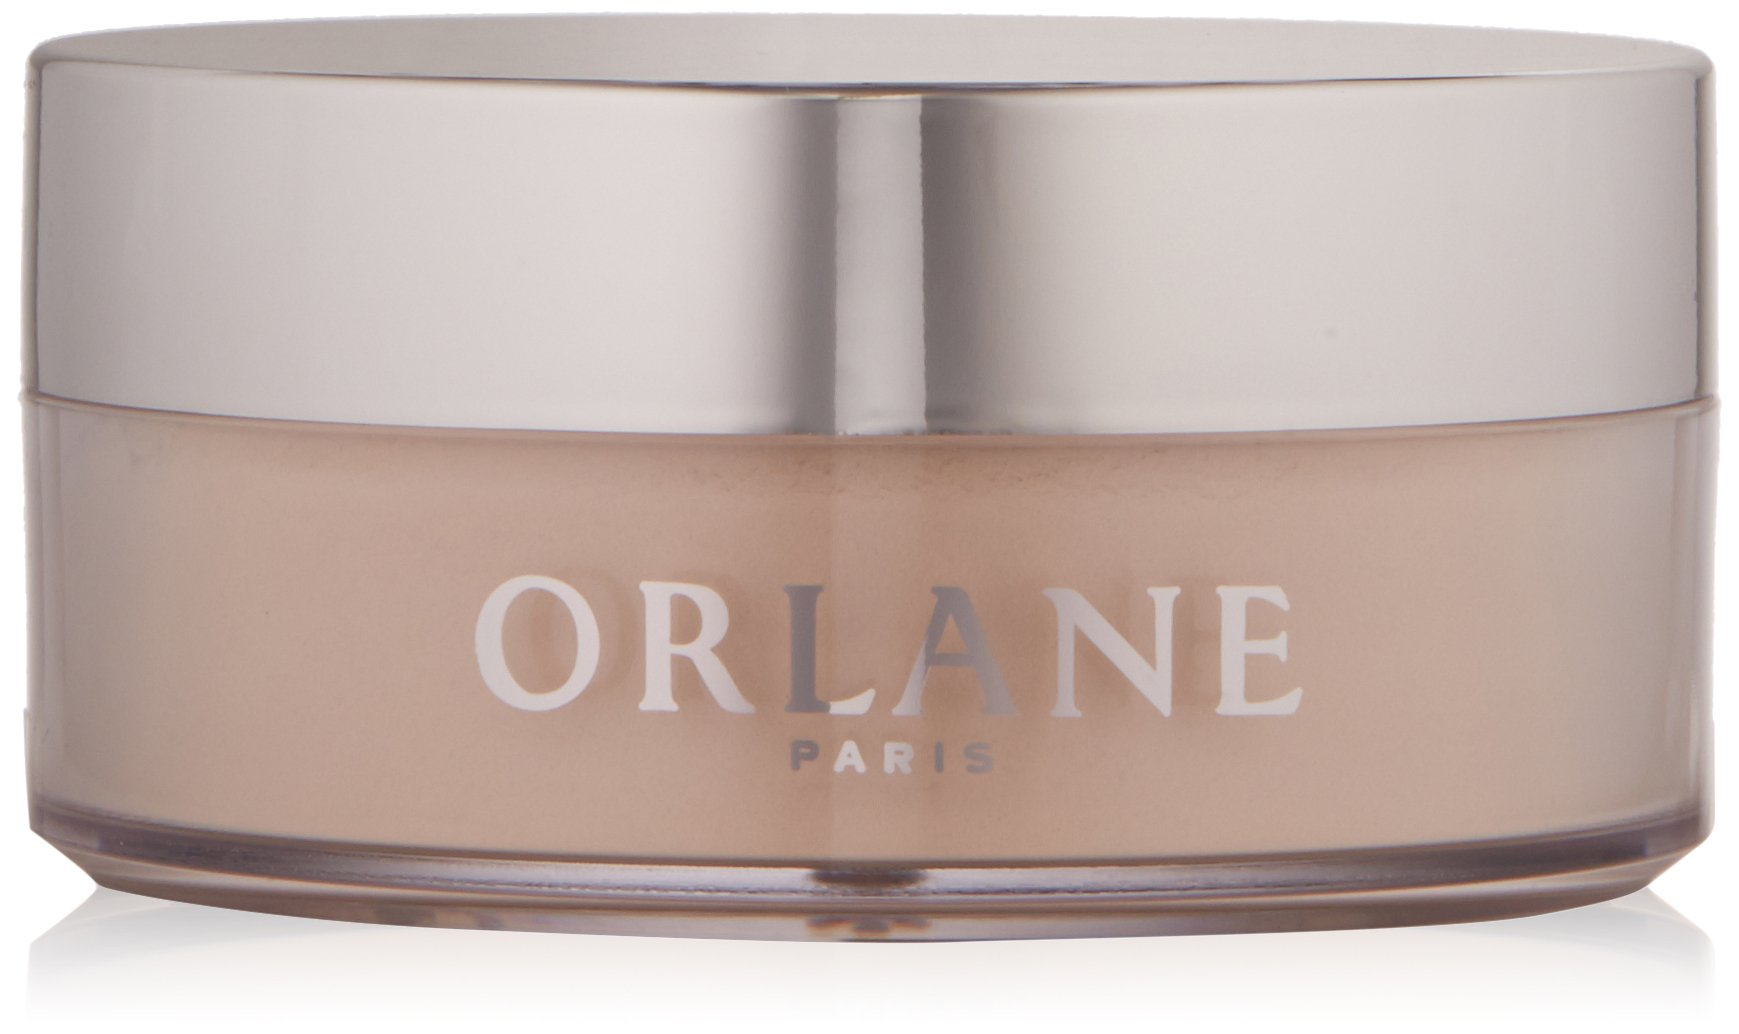 Orlane paris bronzing powder soleil cuivre 02 for Paris libre